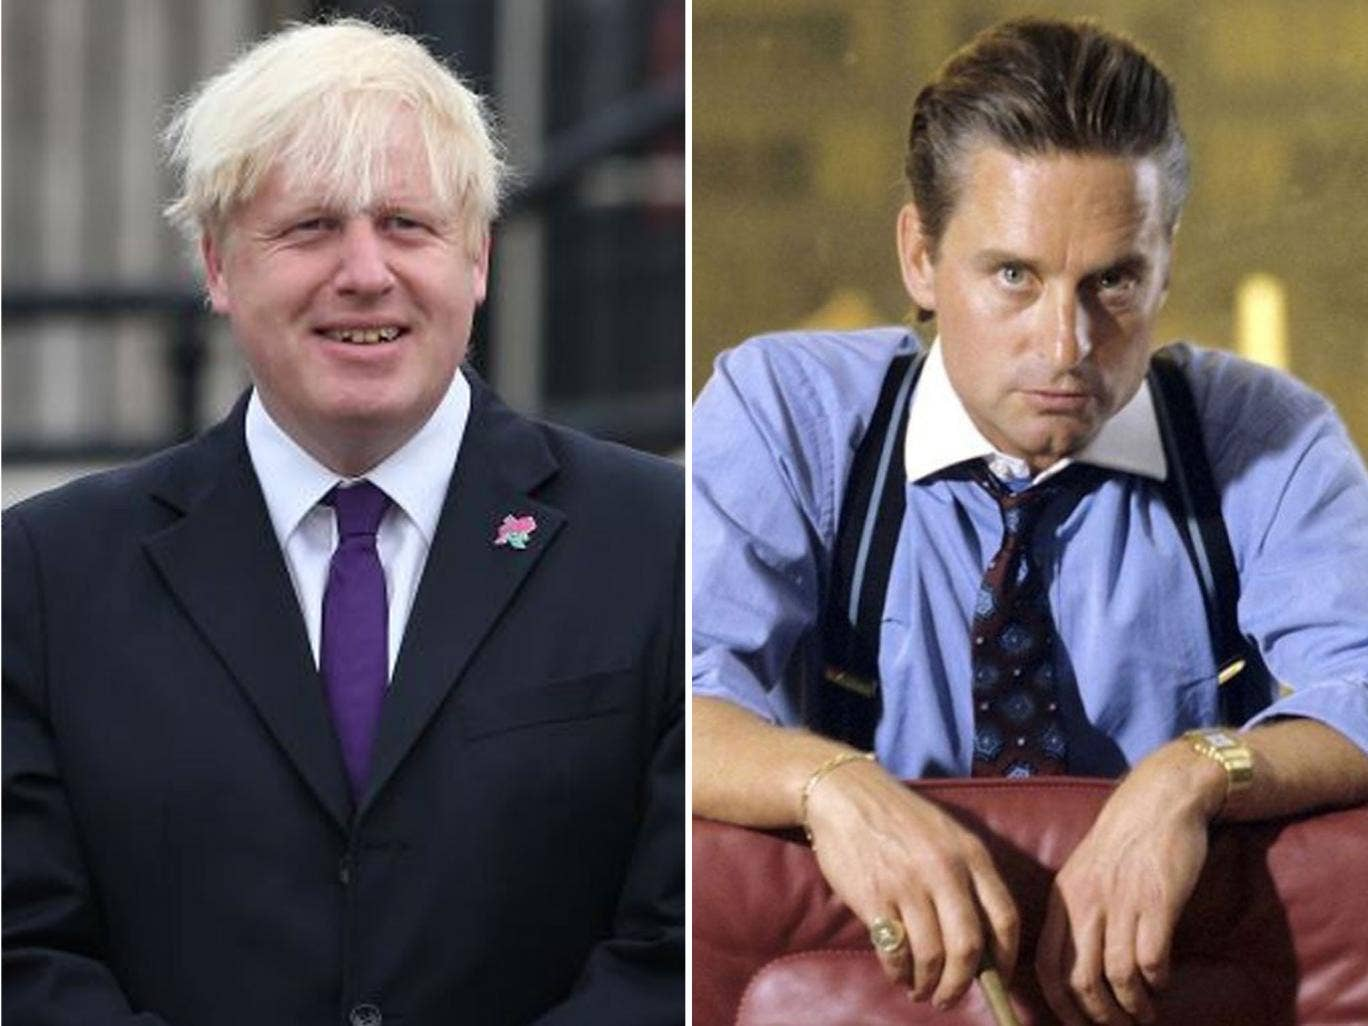 'Embrace a culture of greed': But who said it? London Mayor Boris Johnson or Michael Douglas' Gordon Gekko in 'Wall Street'?